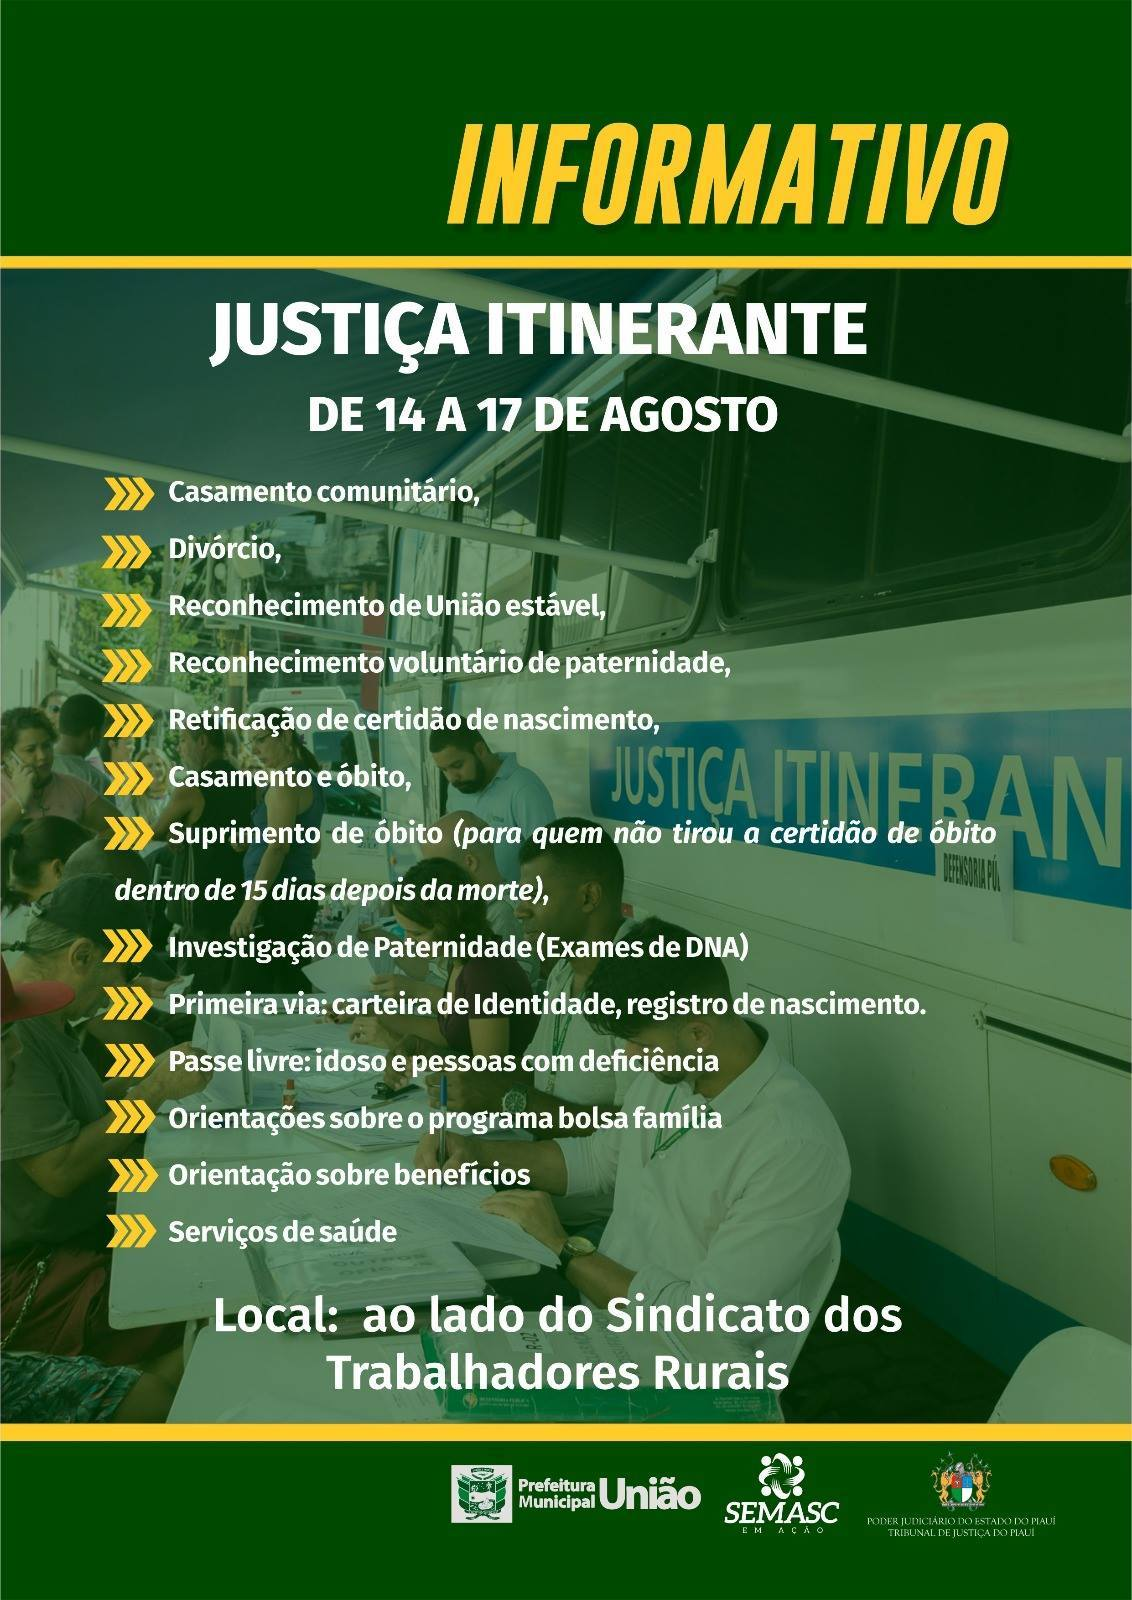 Justica Itinerante Calendario 2019 Campo Grande Ms.Prefeitura De Uniao Realiza Justica Itinerante Oferecendo